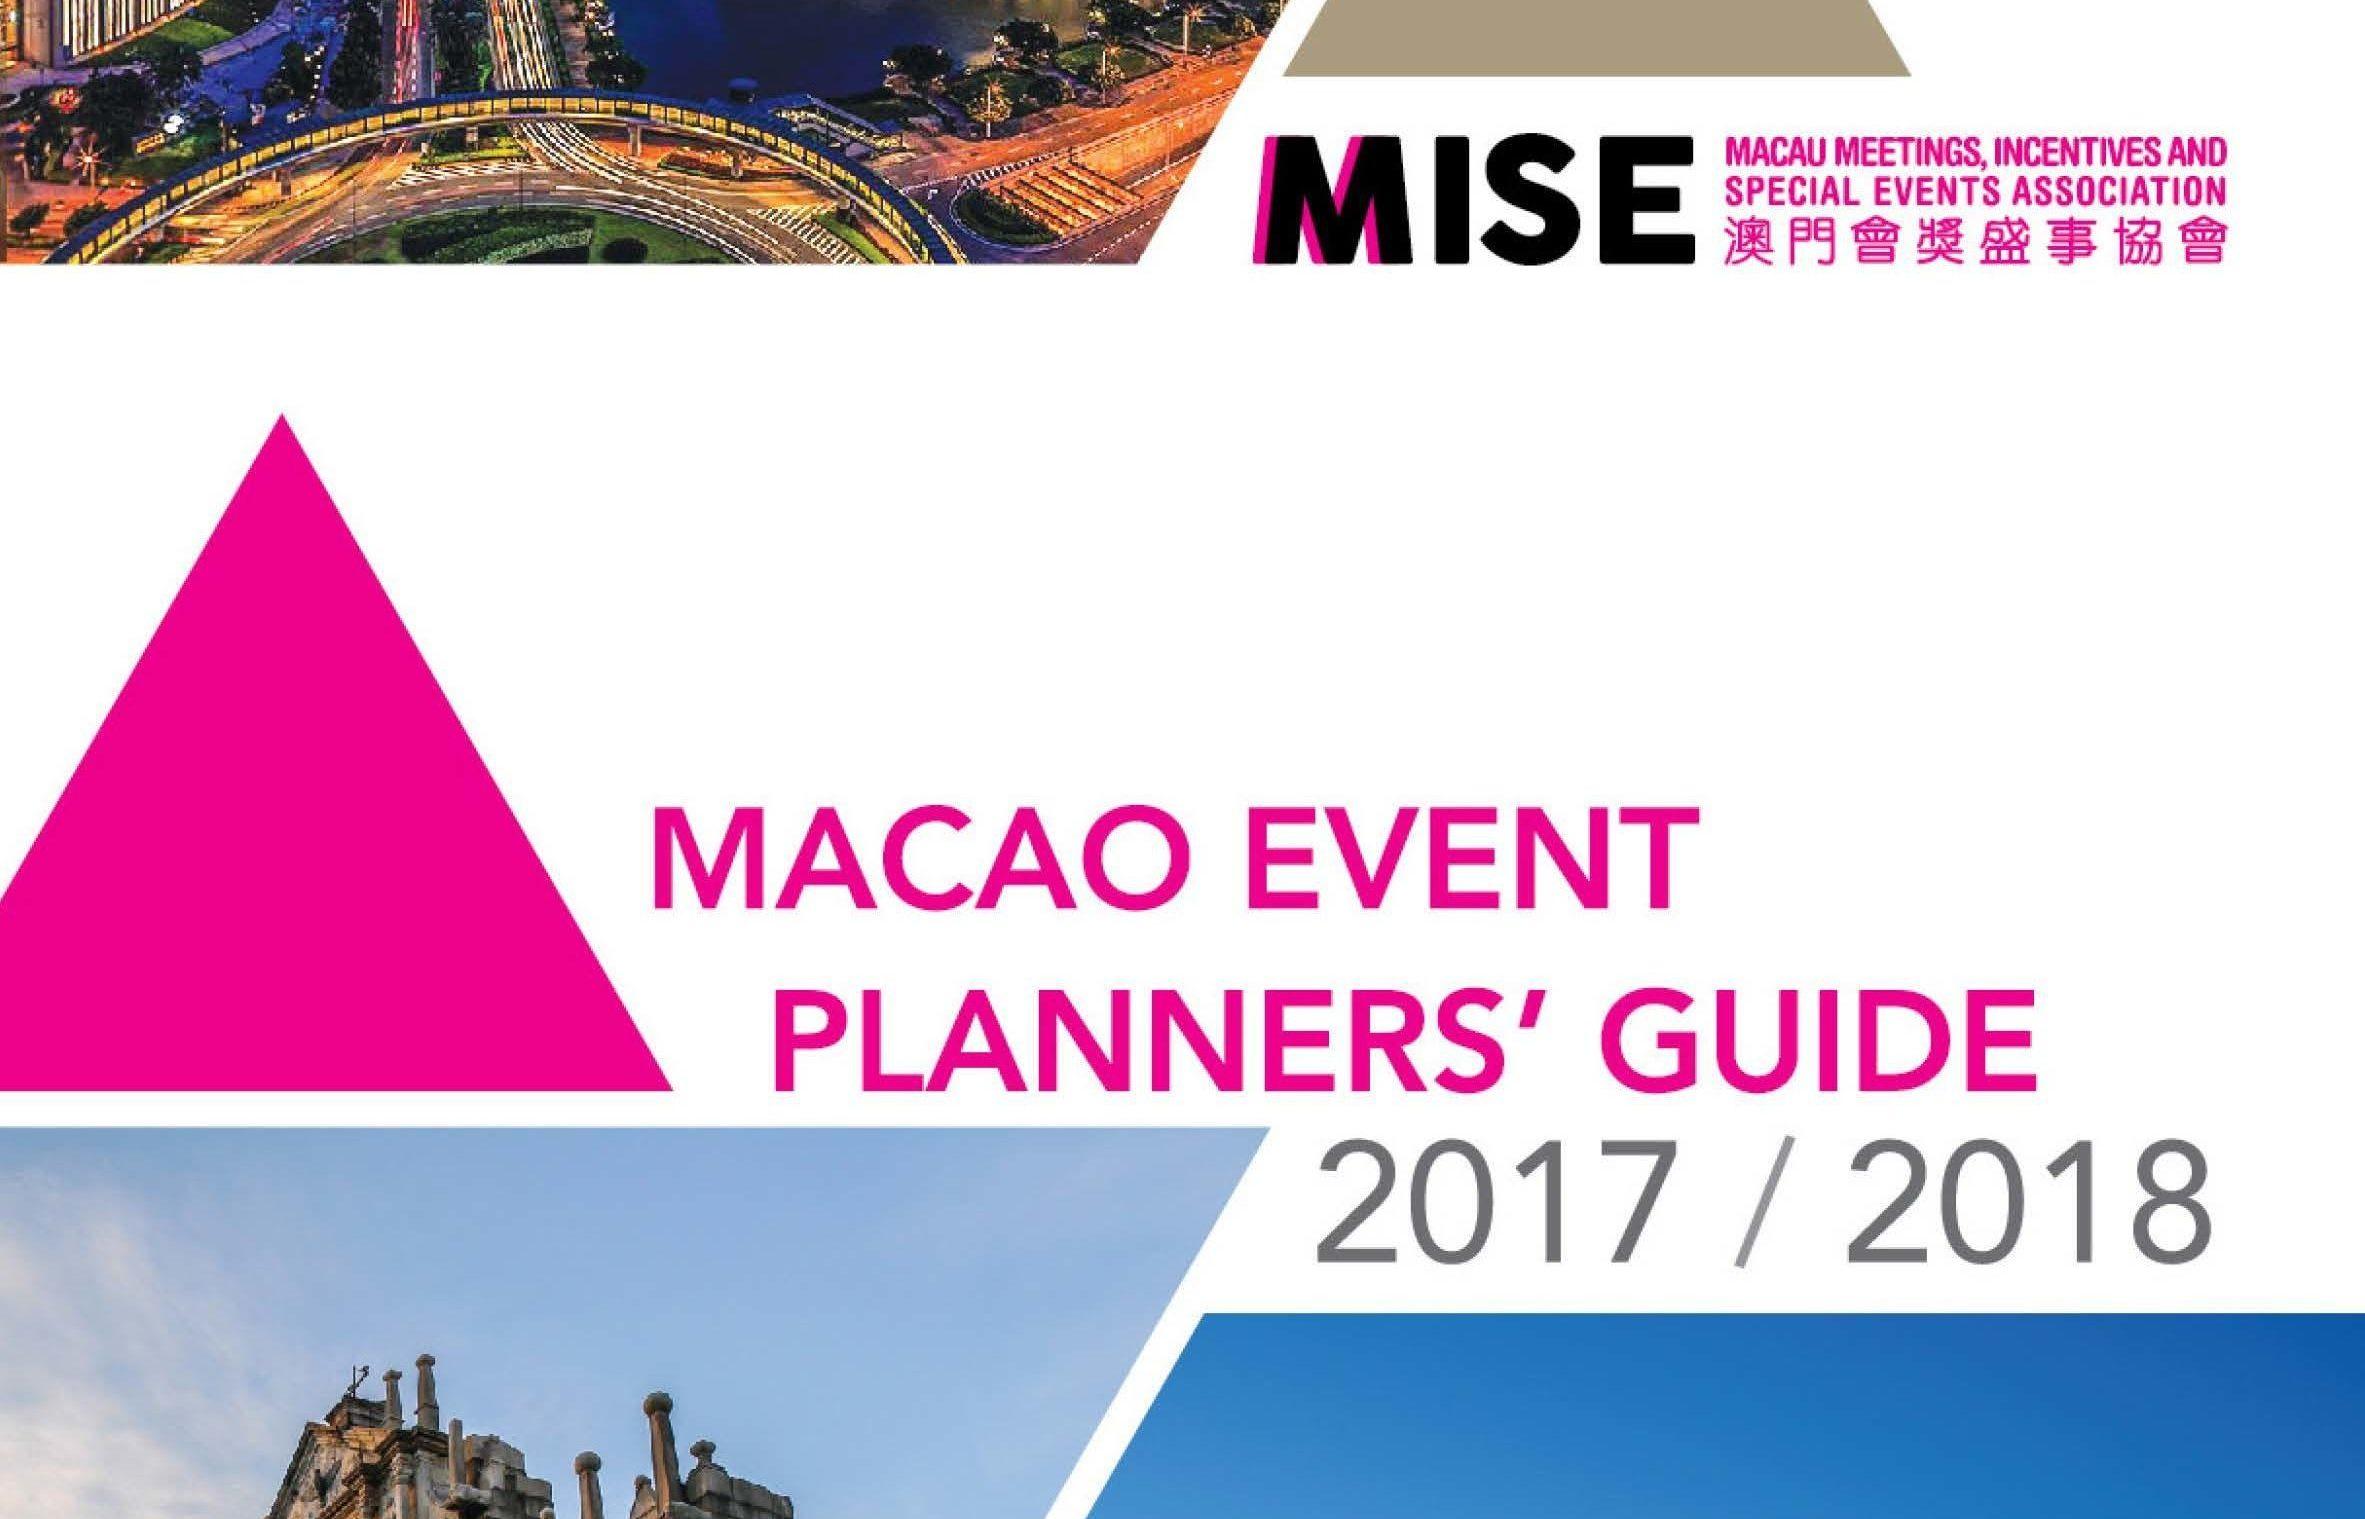 Macau events